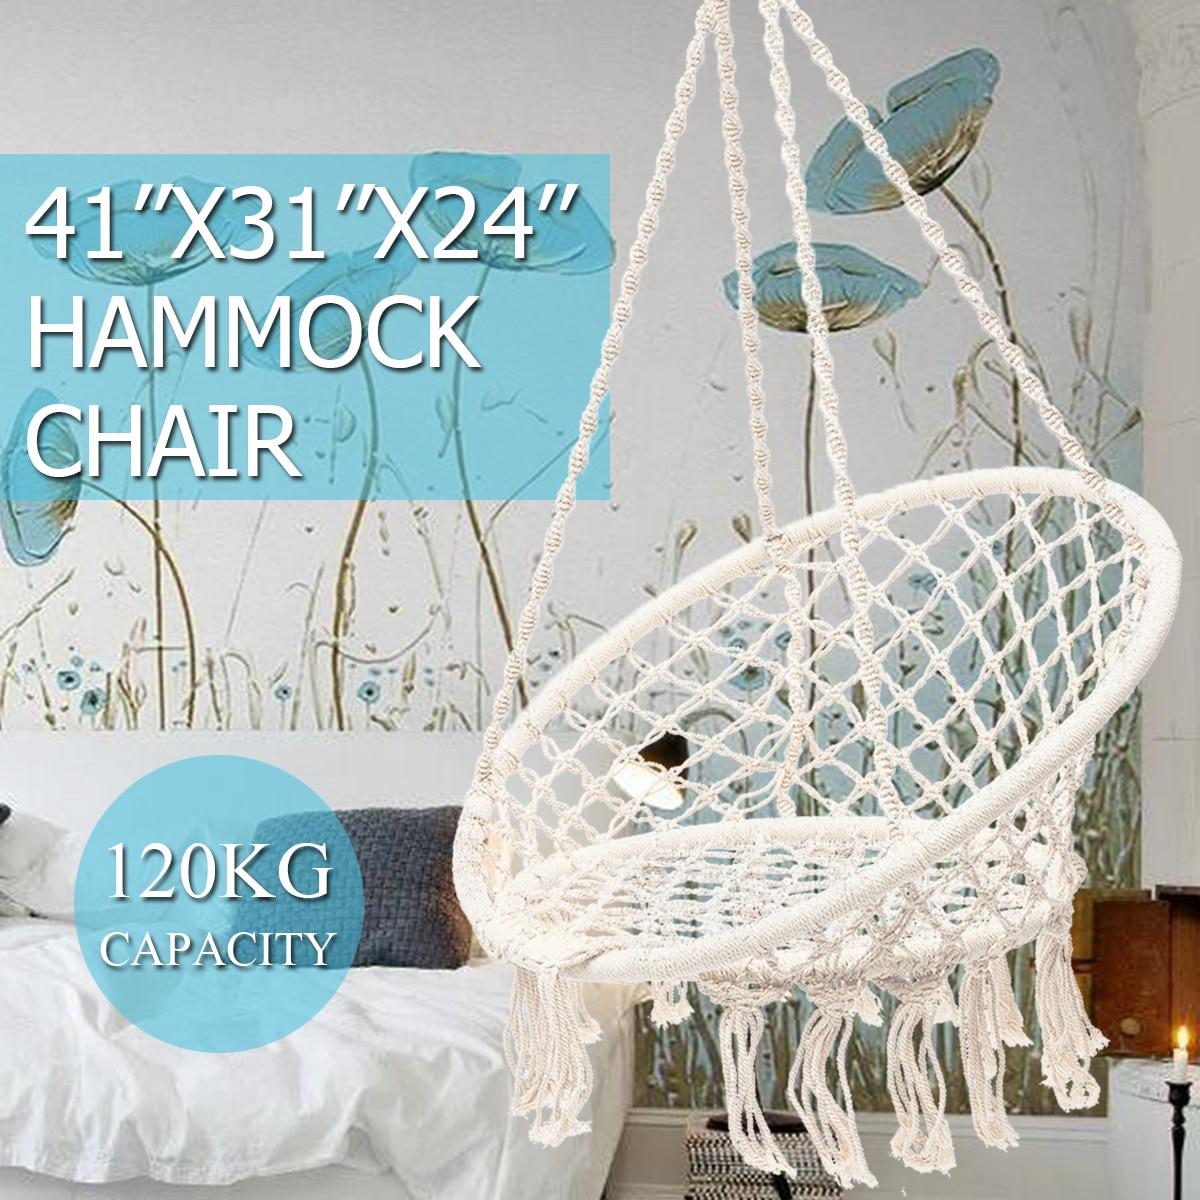 Outdoor Indoor Round Hammocks Chair Nordic Hammock Dormitory Bedroom Swinging Hanging Chair Single Safety Garden Hammock White modern hammocks outdoor hammock chair